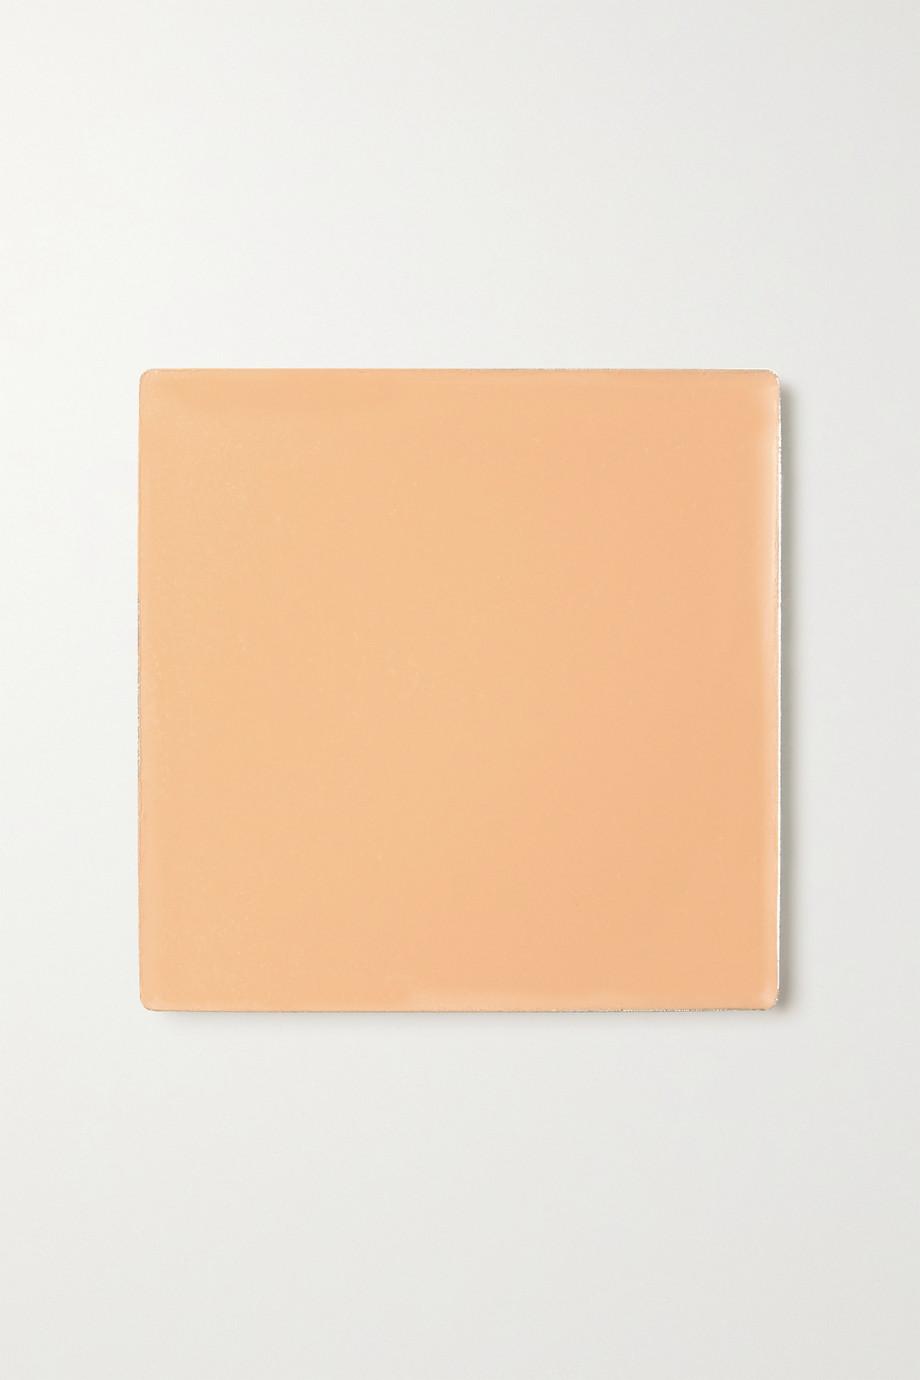 Kjaer Weis Cream Foundation Refill - Feathery